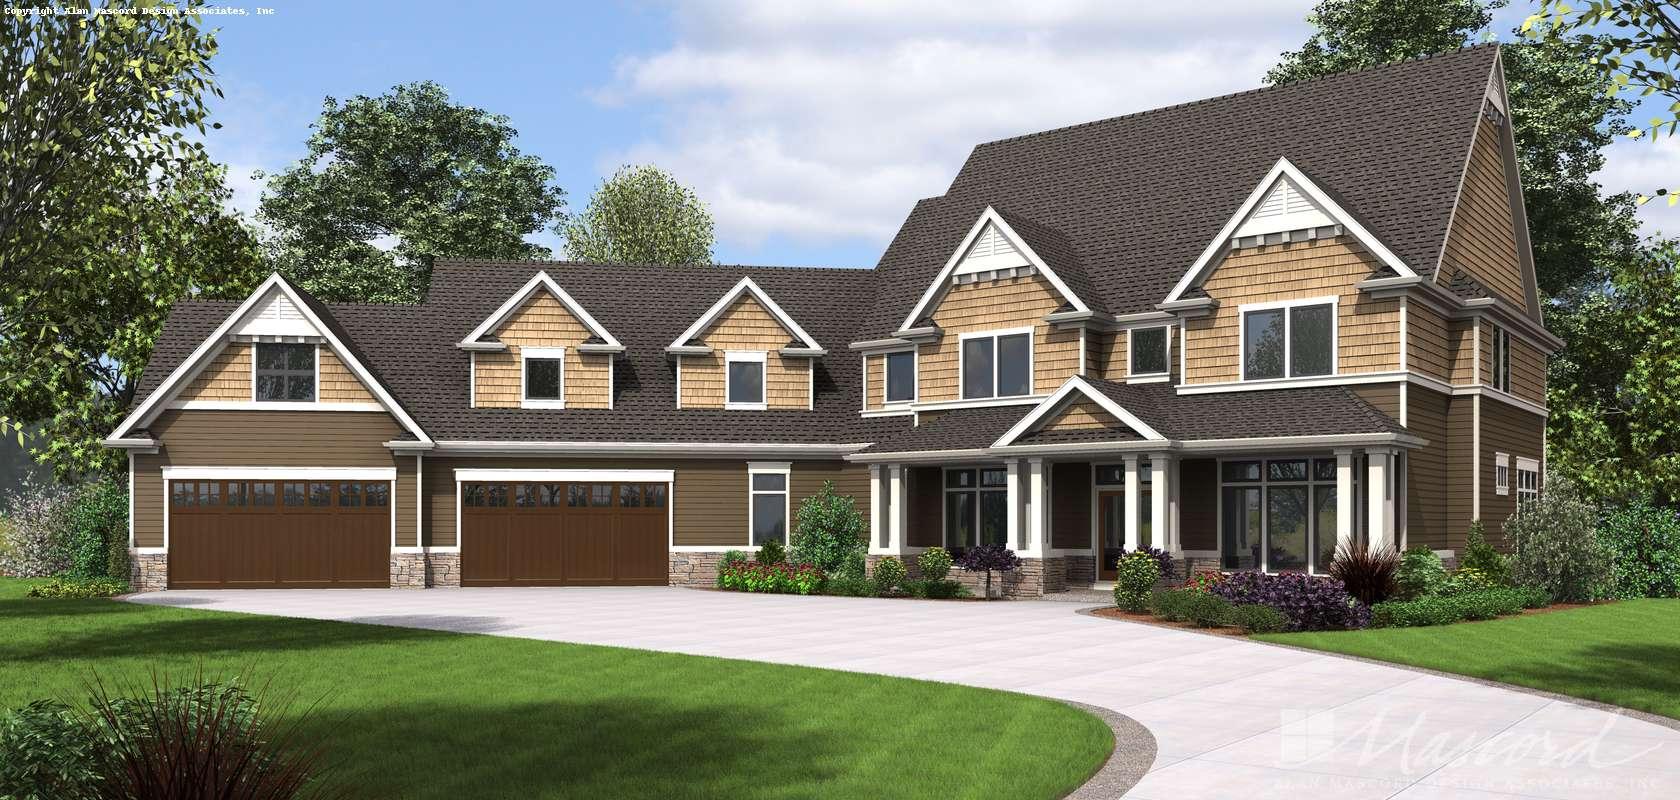 Mascord House Plan 2474: The Morristown